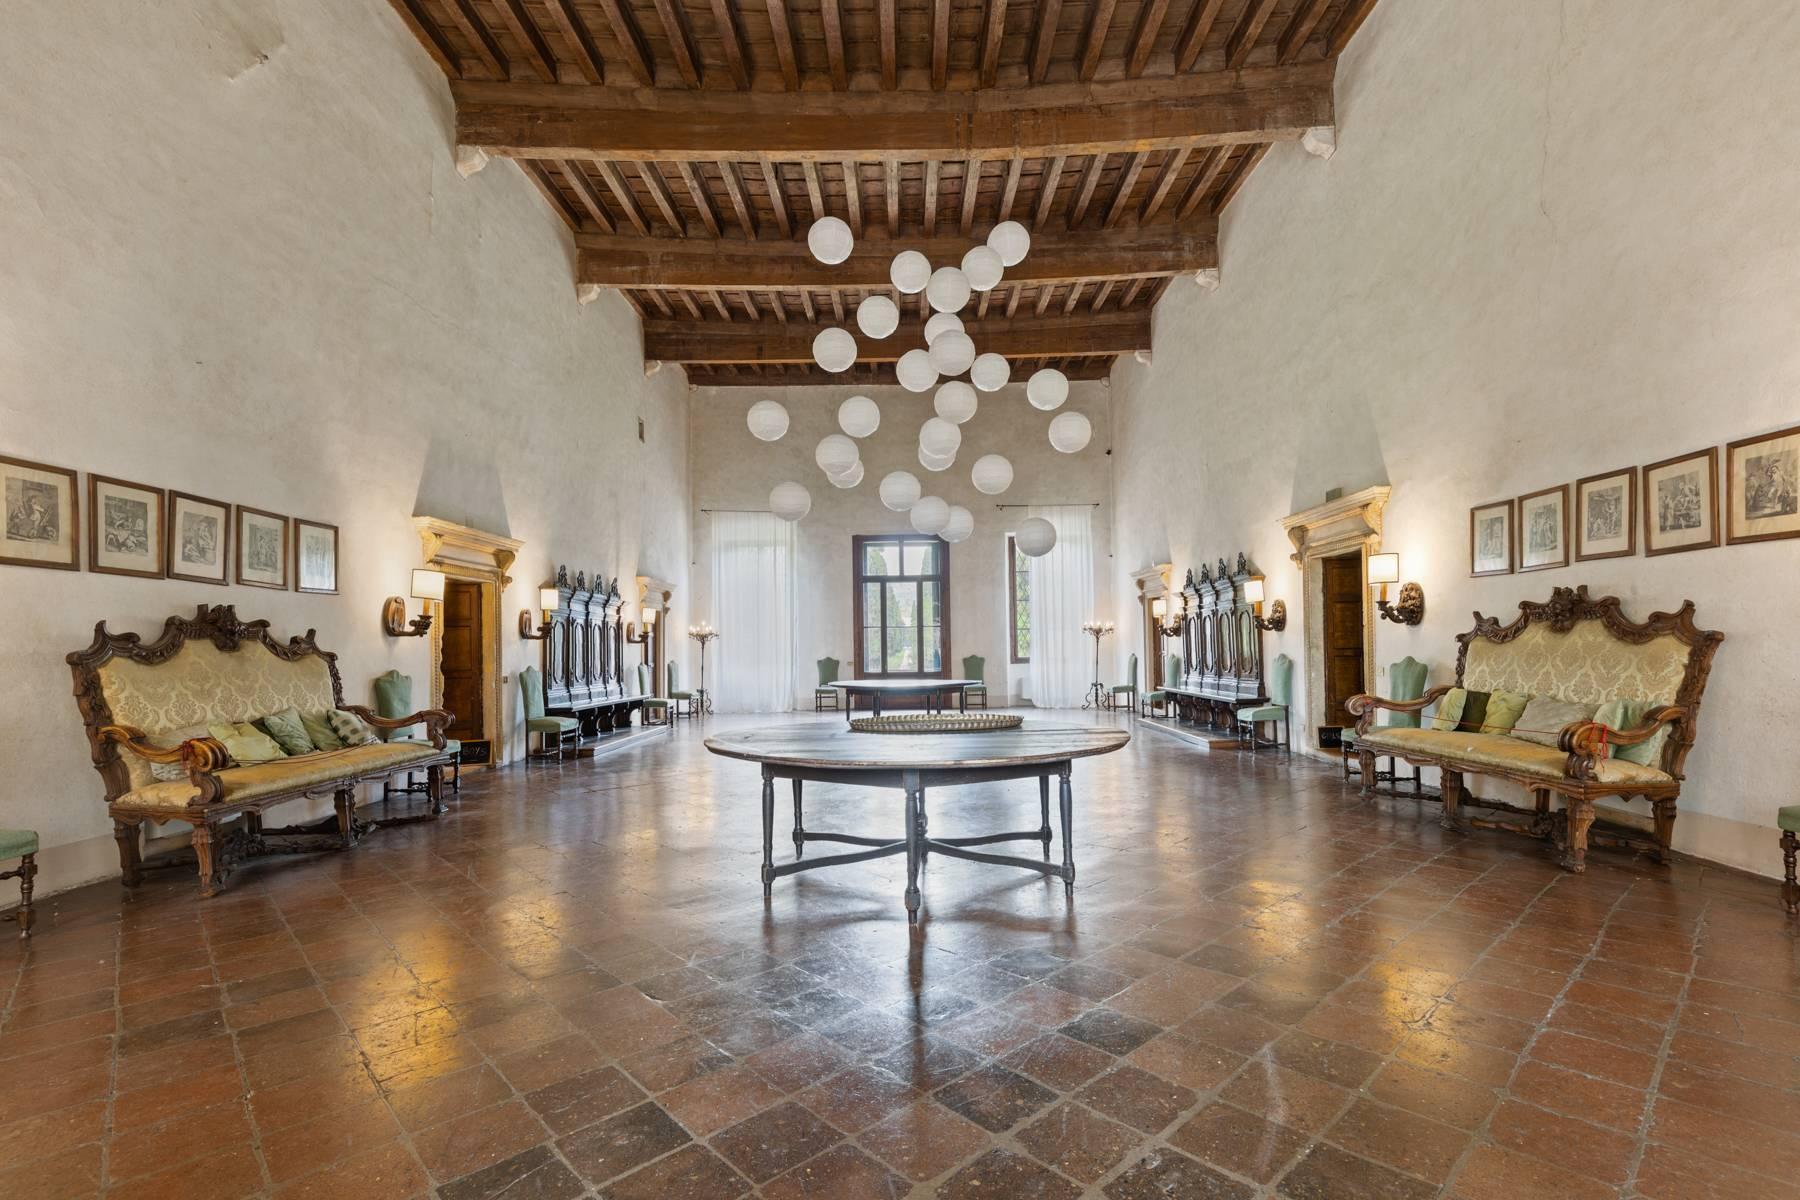 Affascinante villa Veneta a pochi minuti da Verona - 24